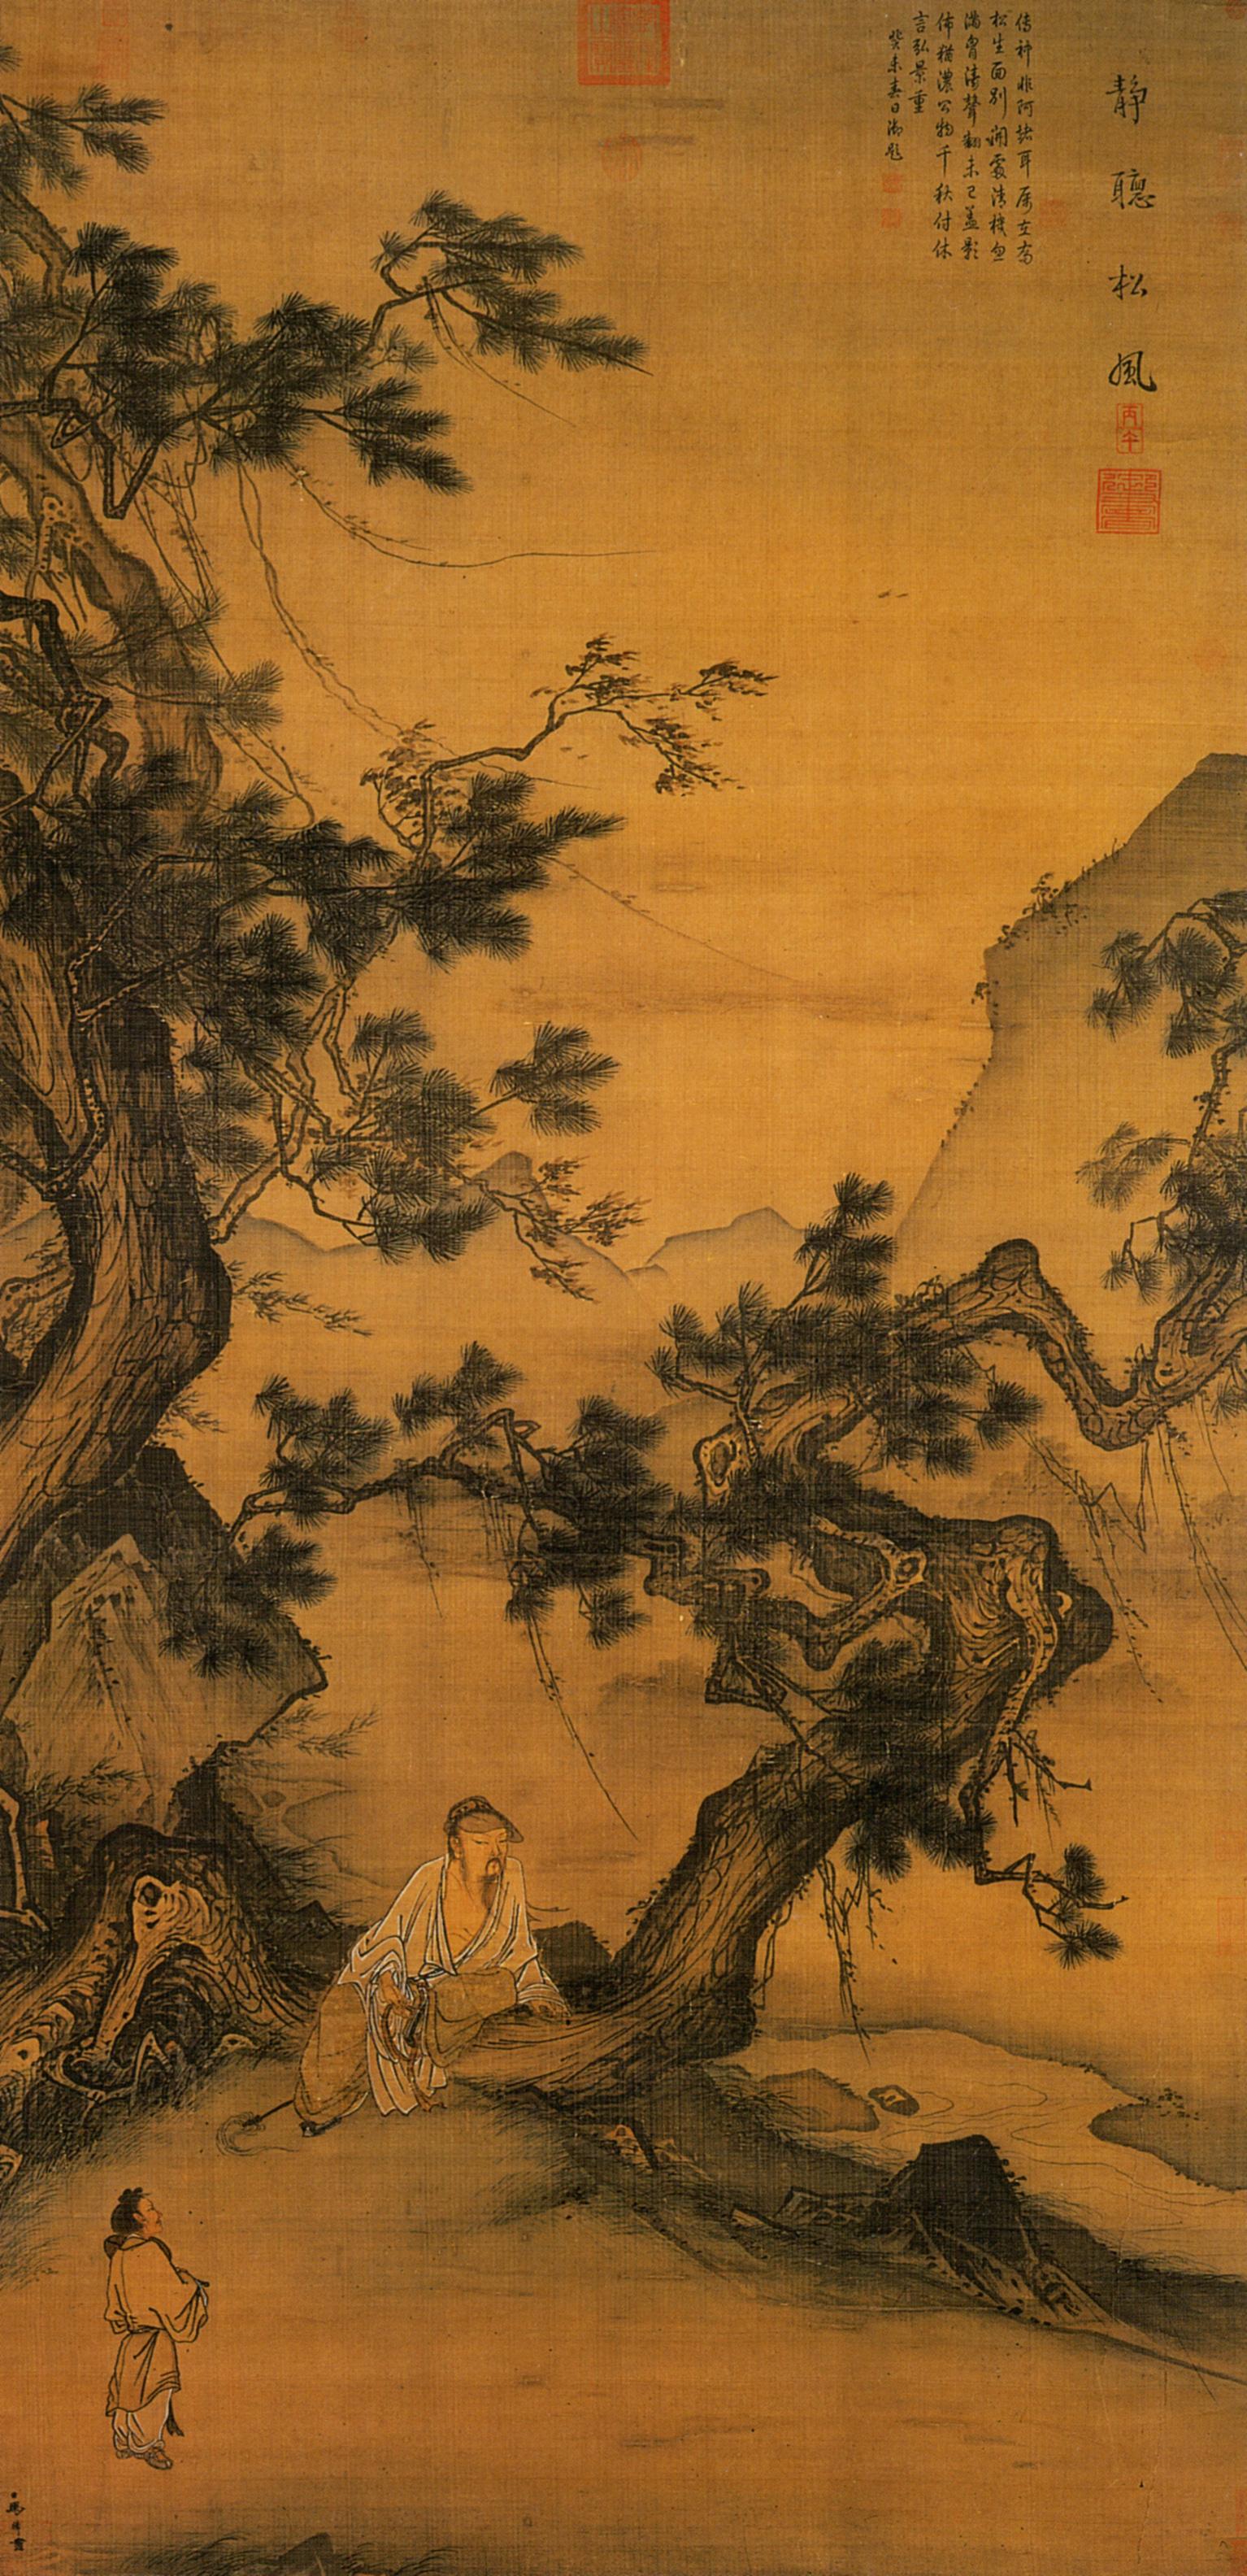 Contoh Gambar Seni Rupa Tradisional : contoh, gambar, tradisional, Lukisan, Tionghoa, Wikipedia, Bahasa, Indonesia,, Ensiklopedia, Bebas